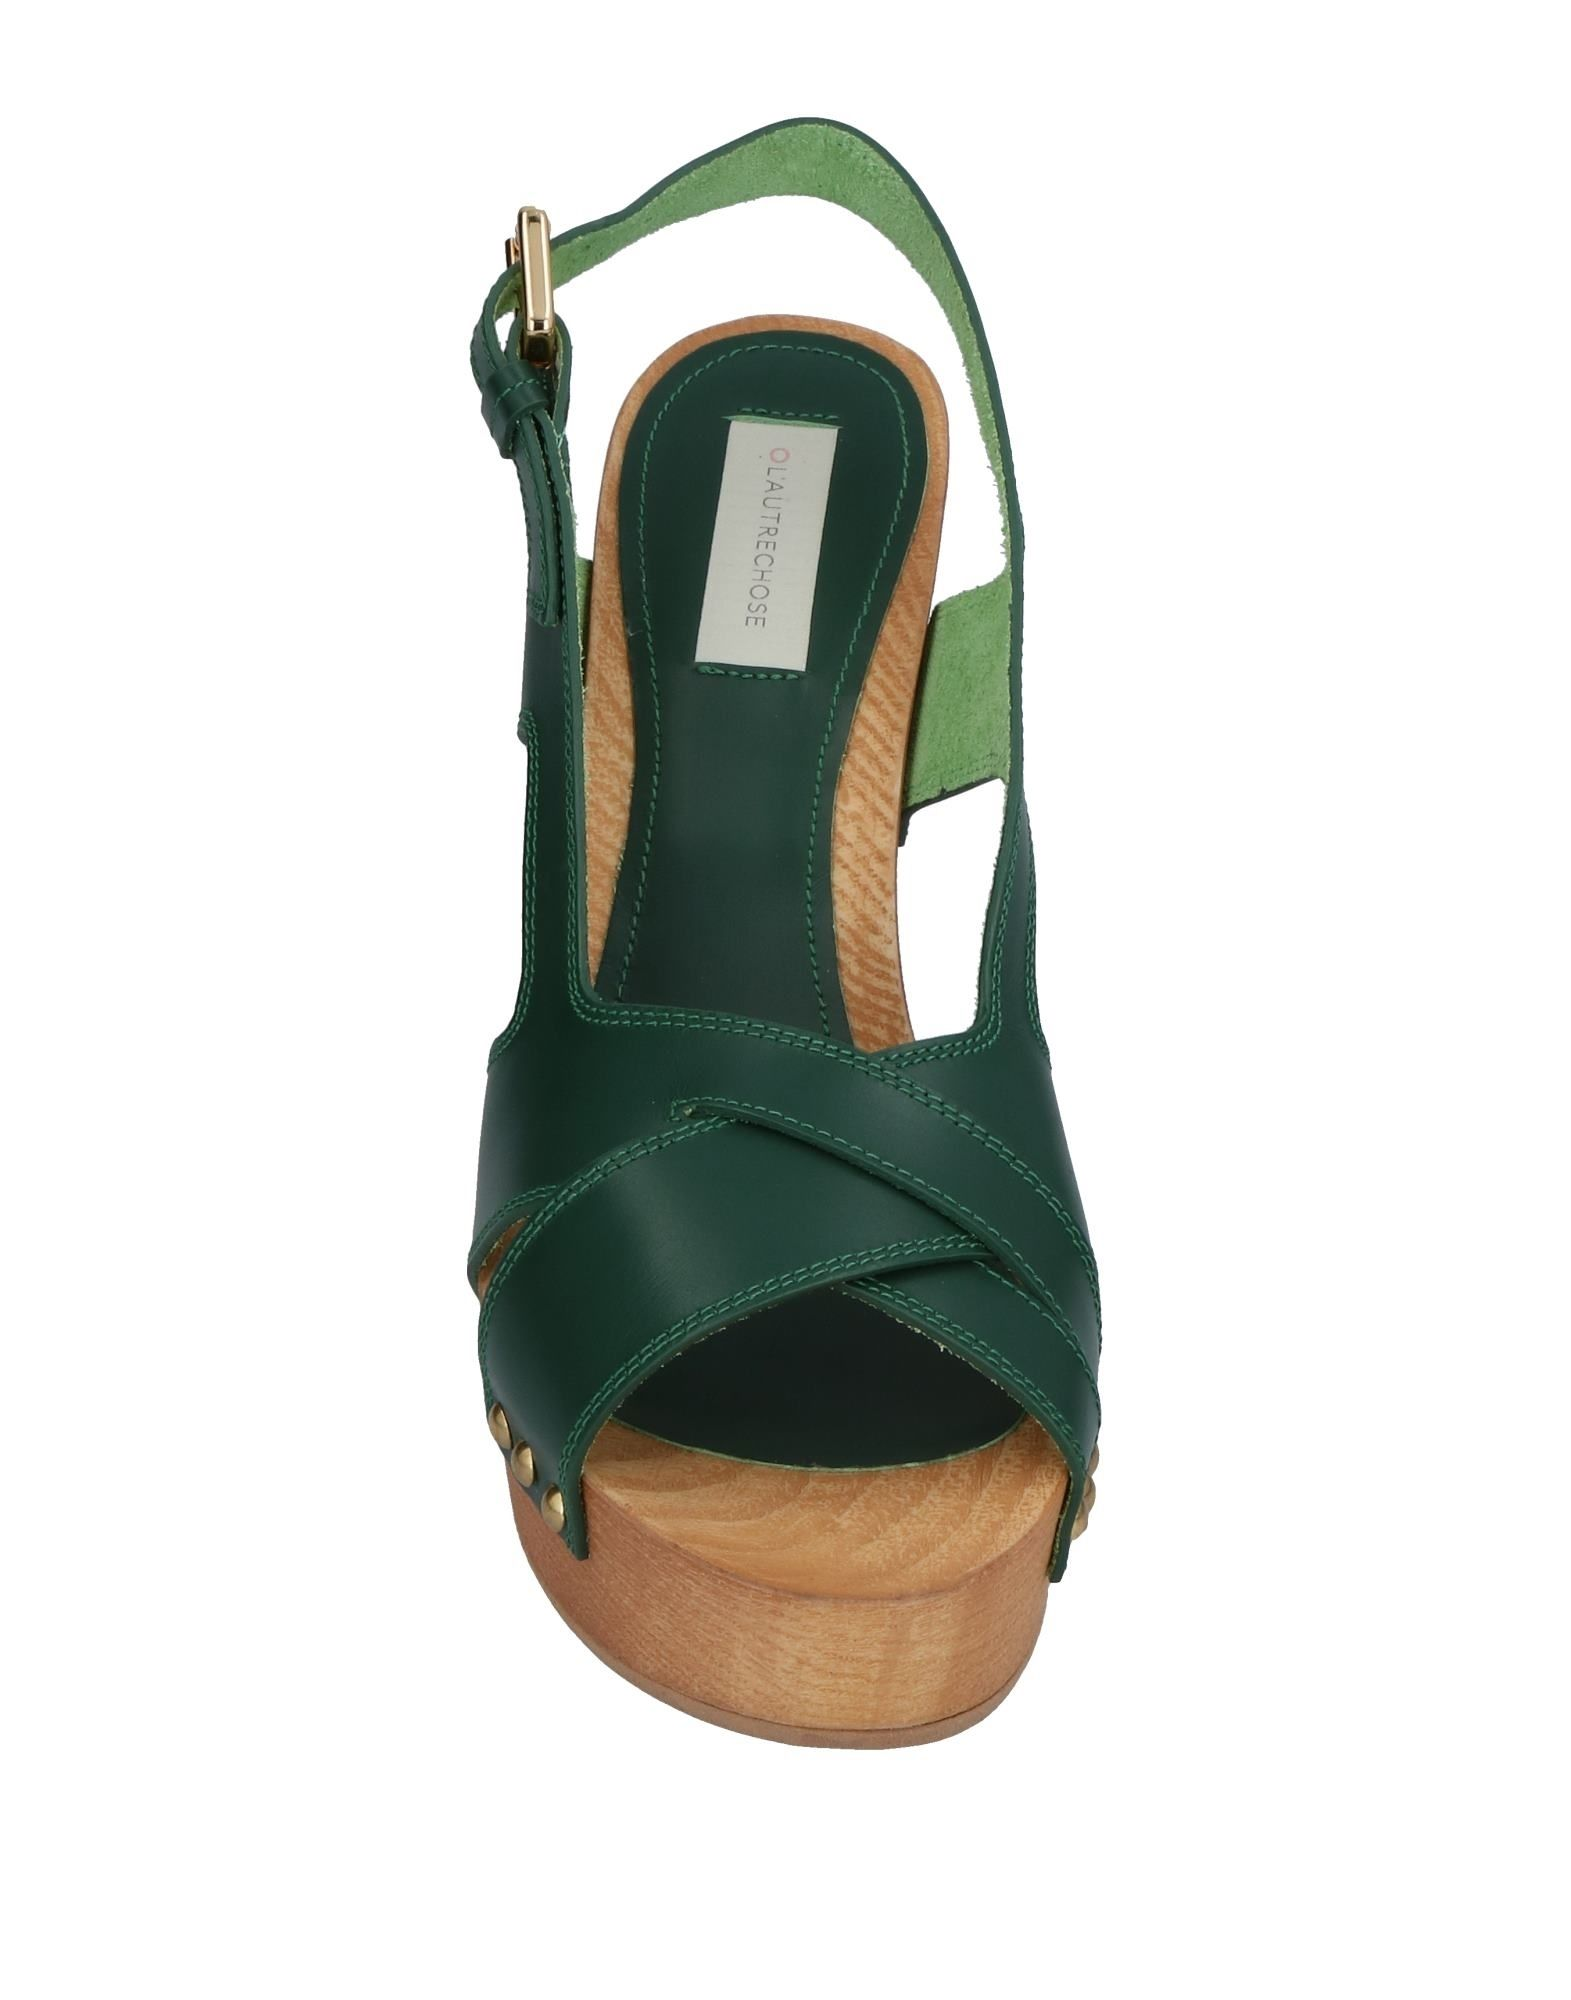 L' Autre Chose Sandalen Damen  11383891SB Gute Qualität beliebte Schuhe